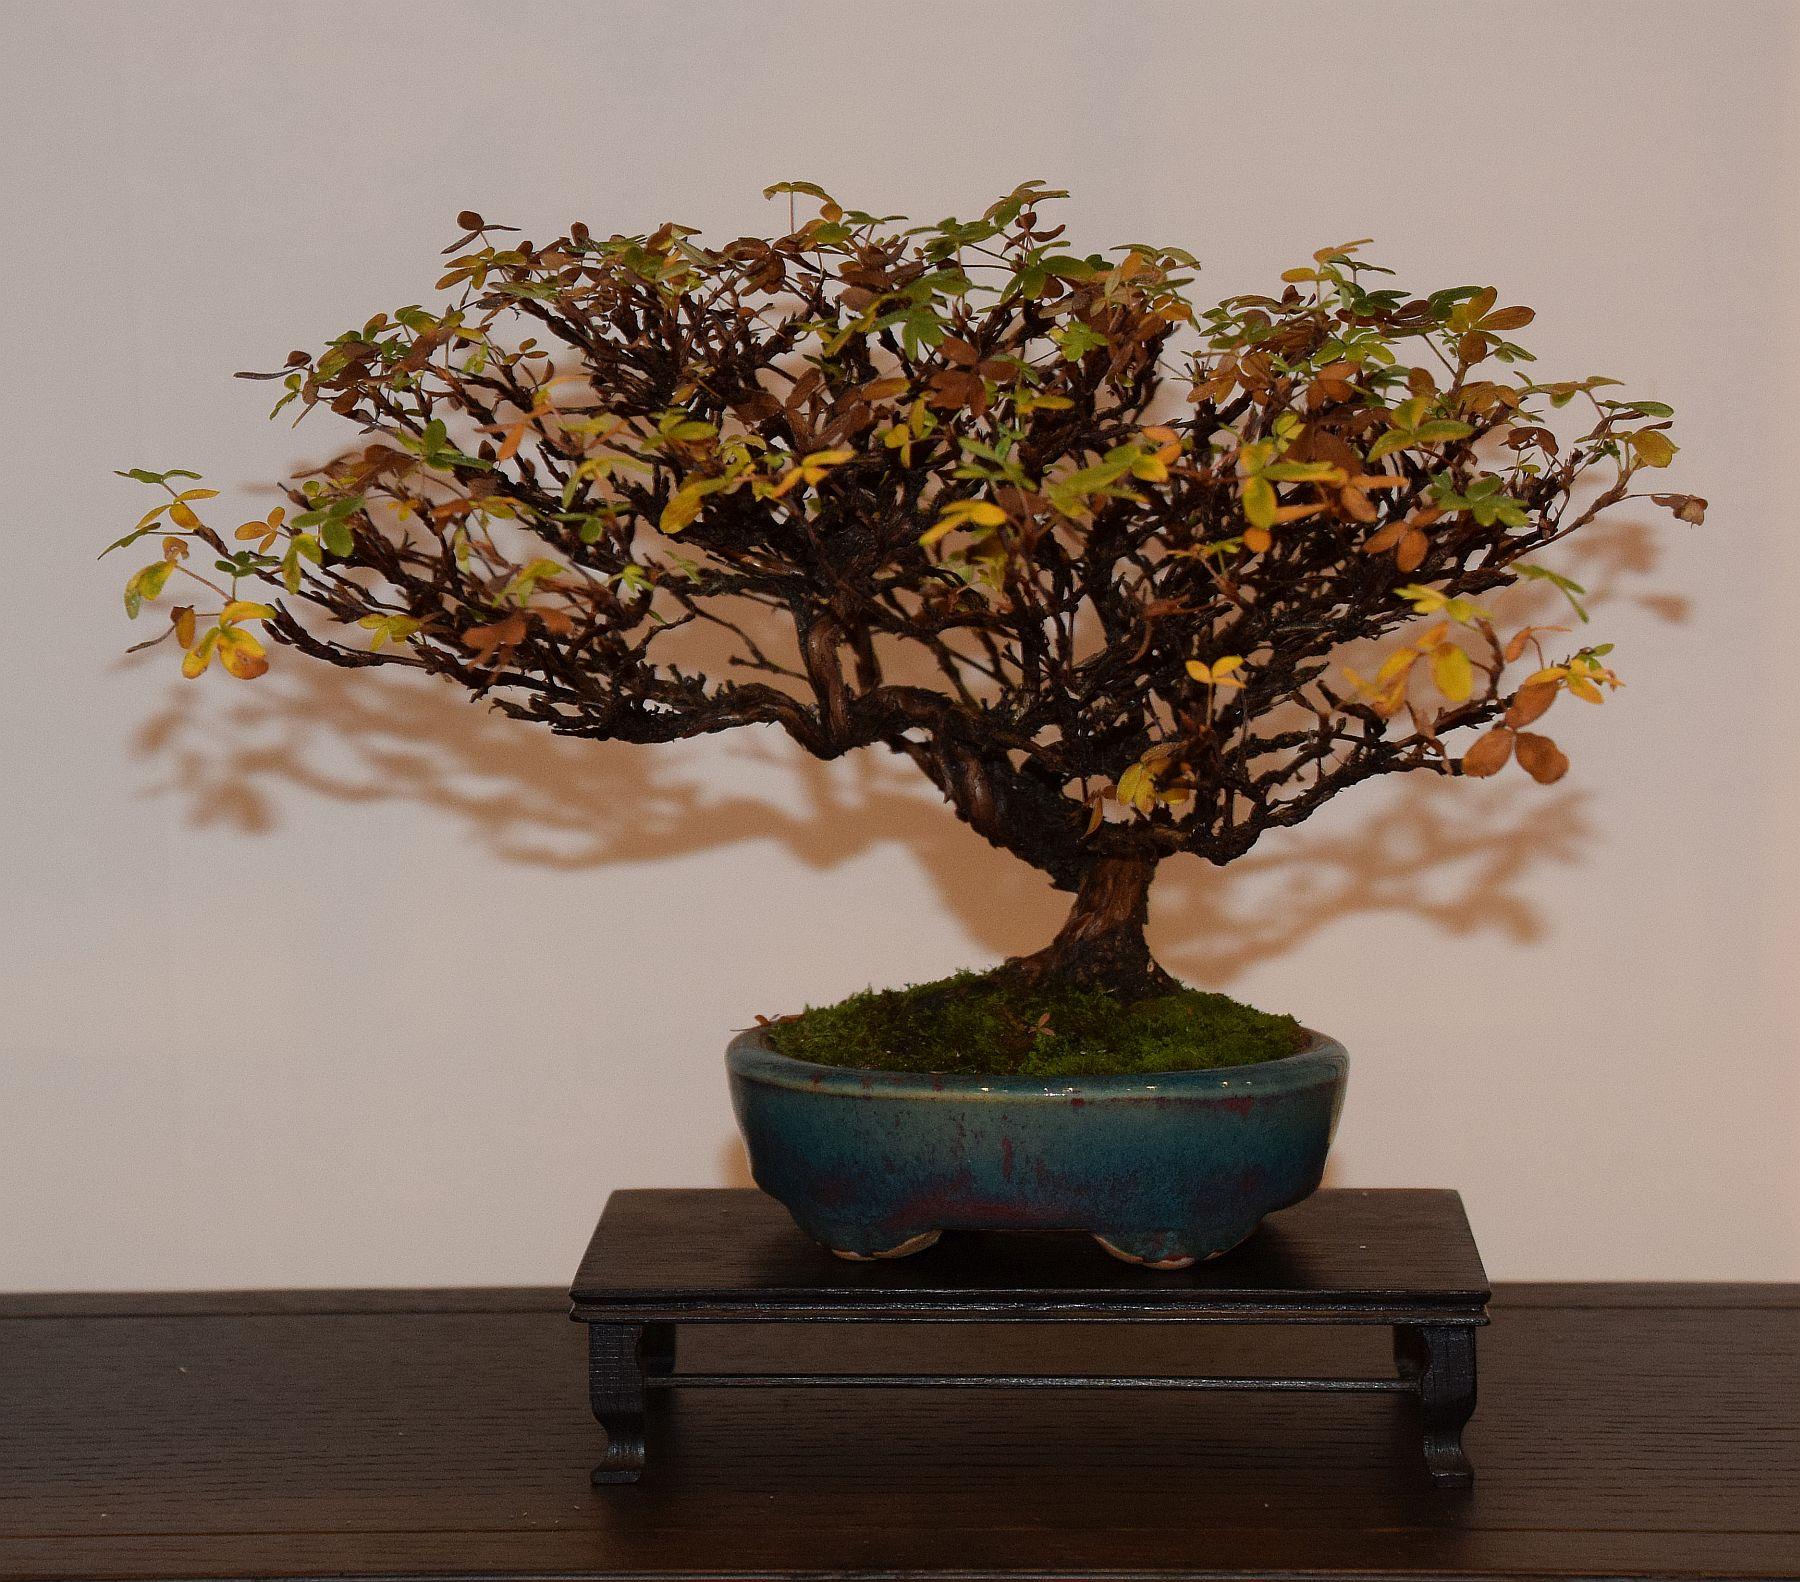 euk-bonsai-ten-2016-club-bonsai-106